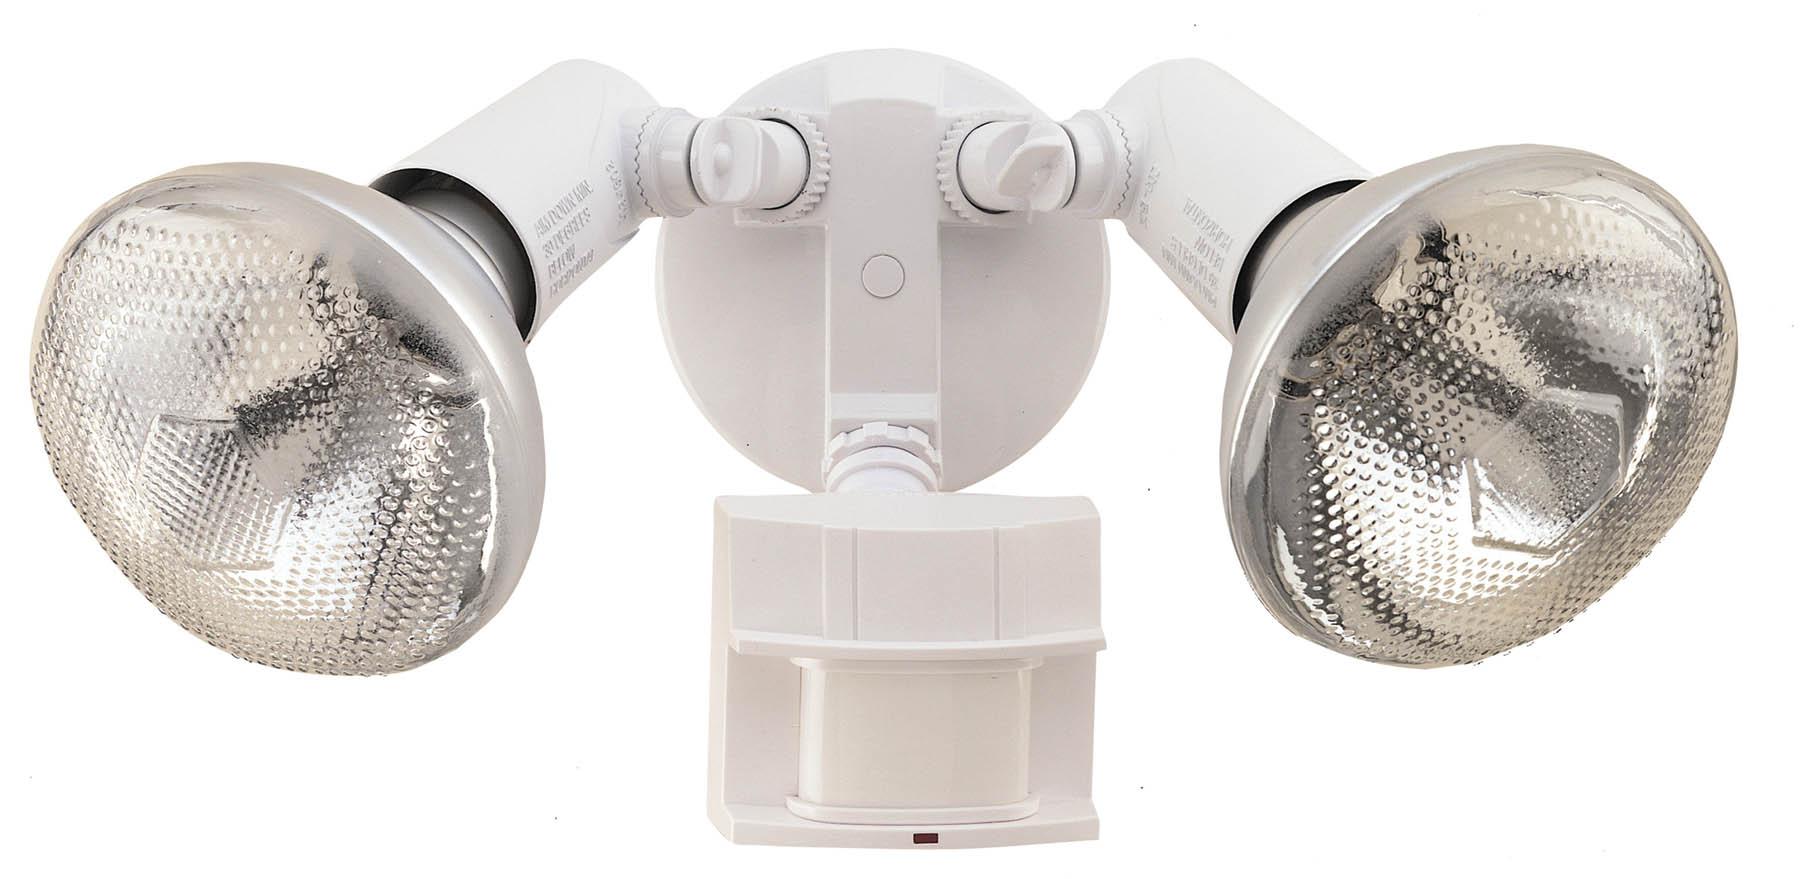 DIGOO DG-HOSA 433MHz Doorbell Button Compatible with HOSA MAHA 2G 3G Security